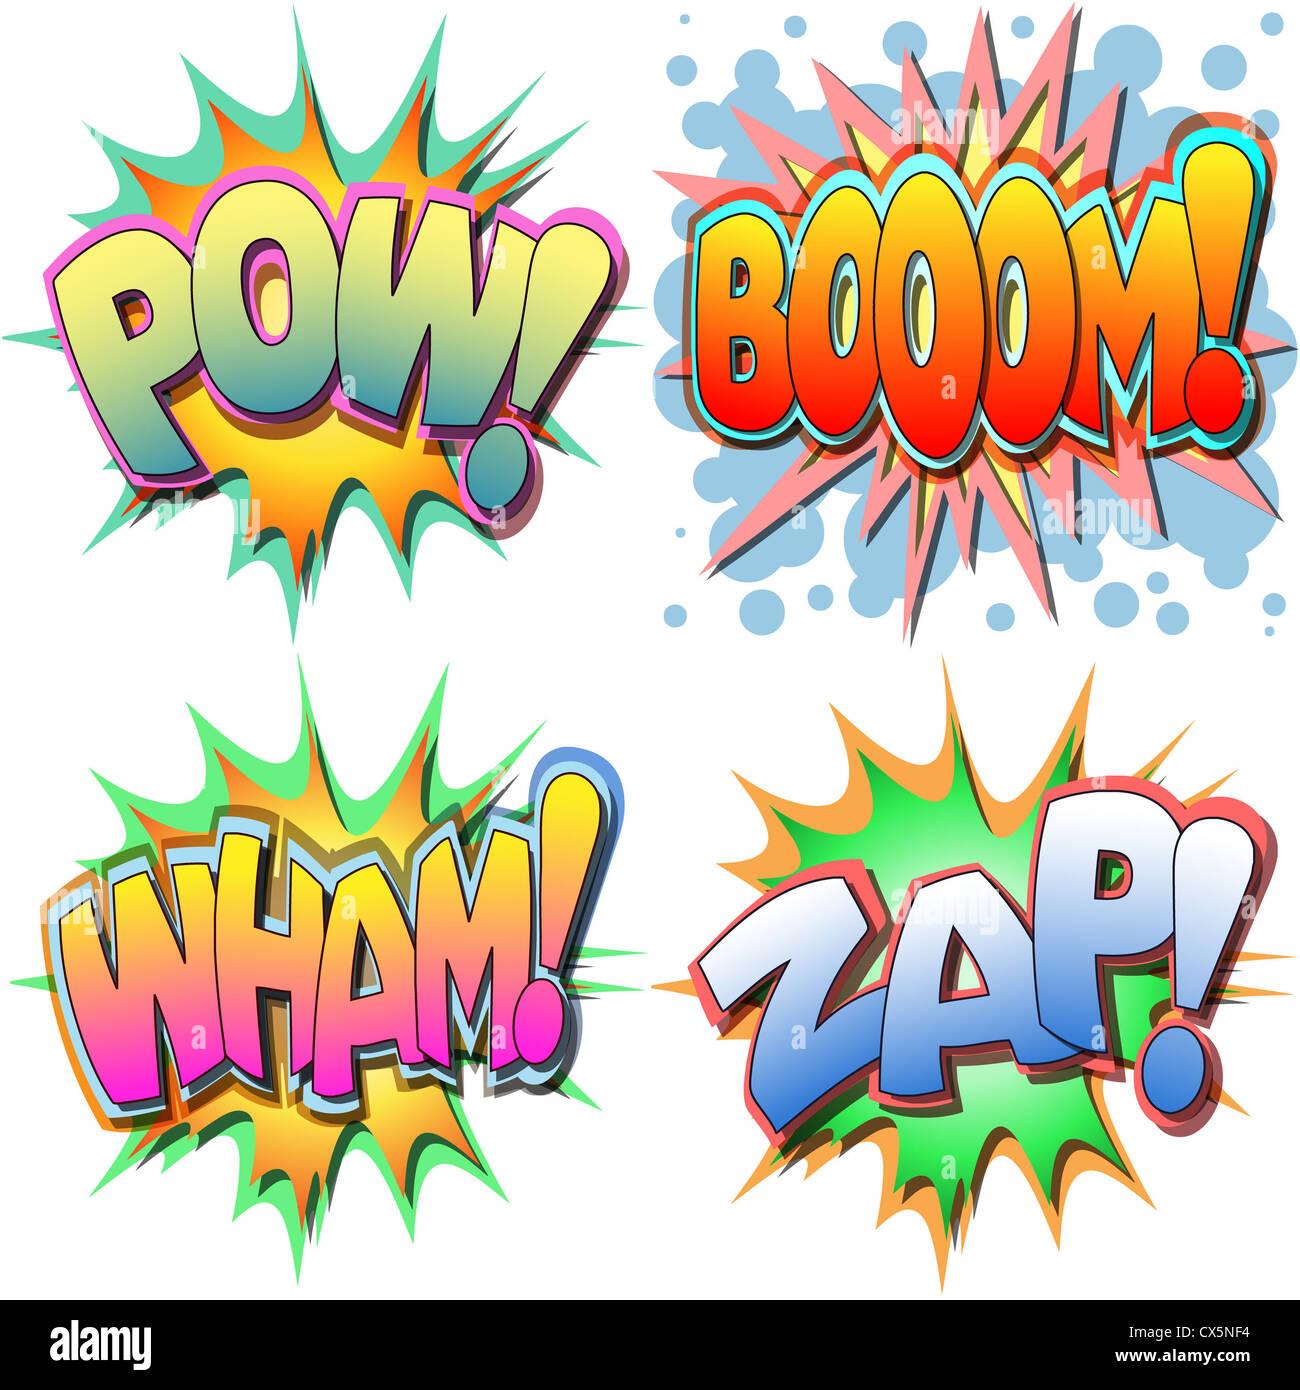 Eine Auswahl an Comic-Buch-Illustrationen Pow, Boom, Wham, Zap Stockbild